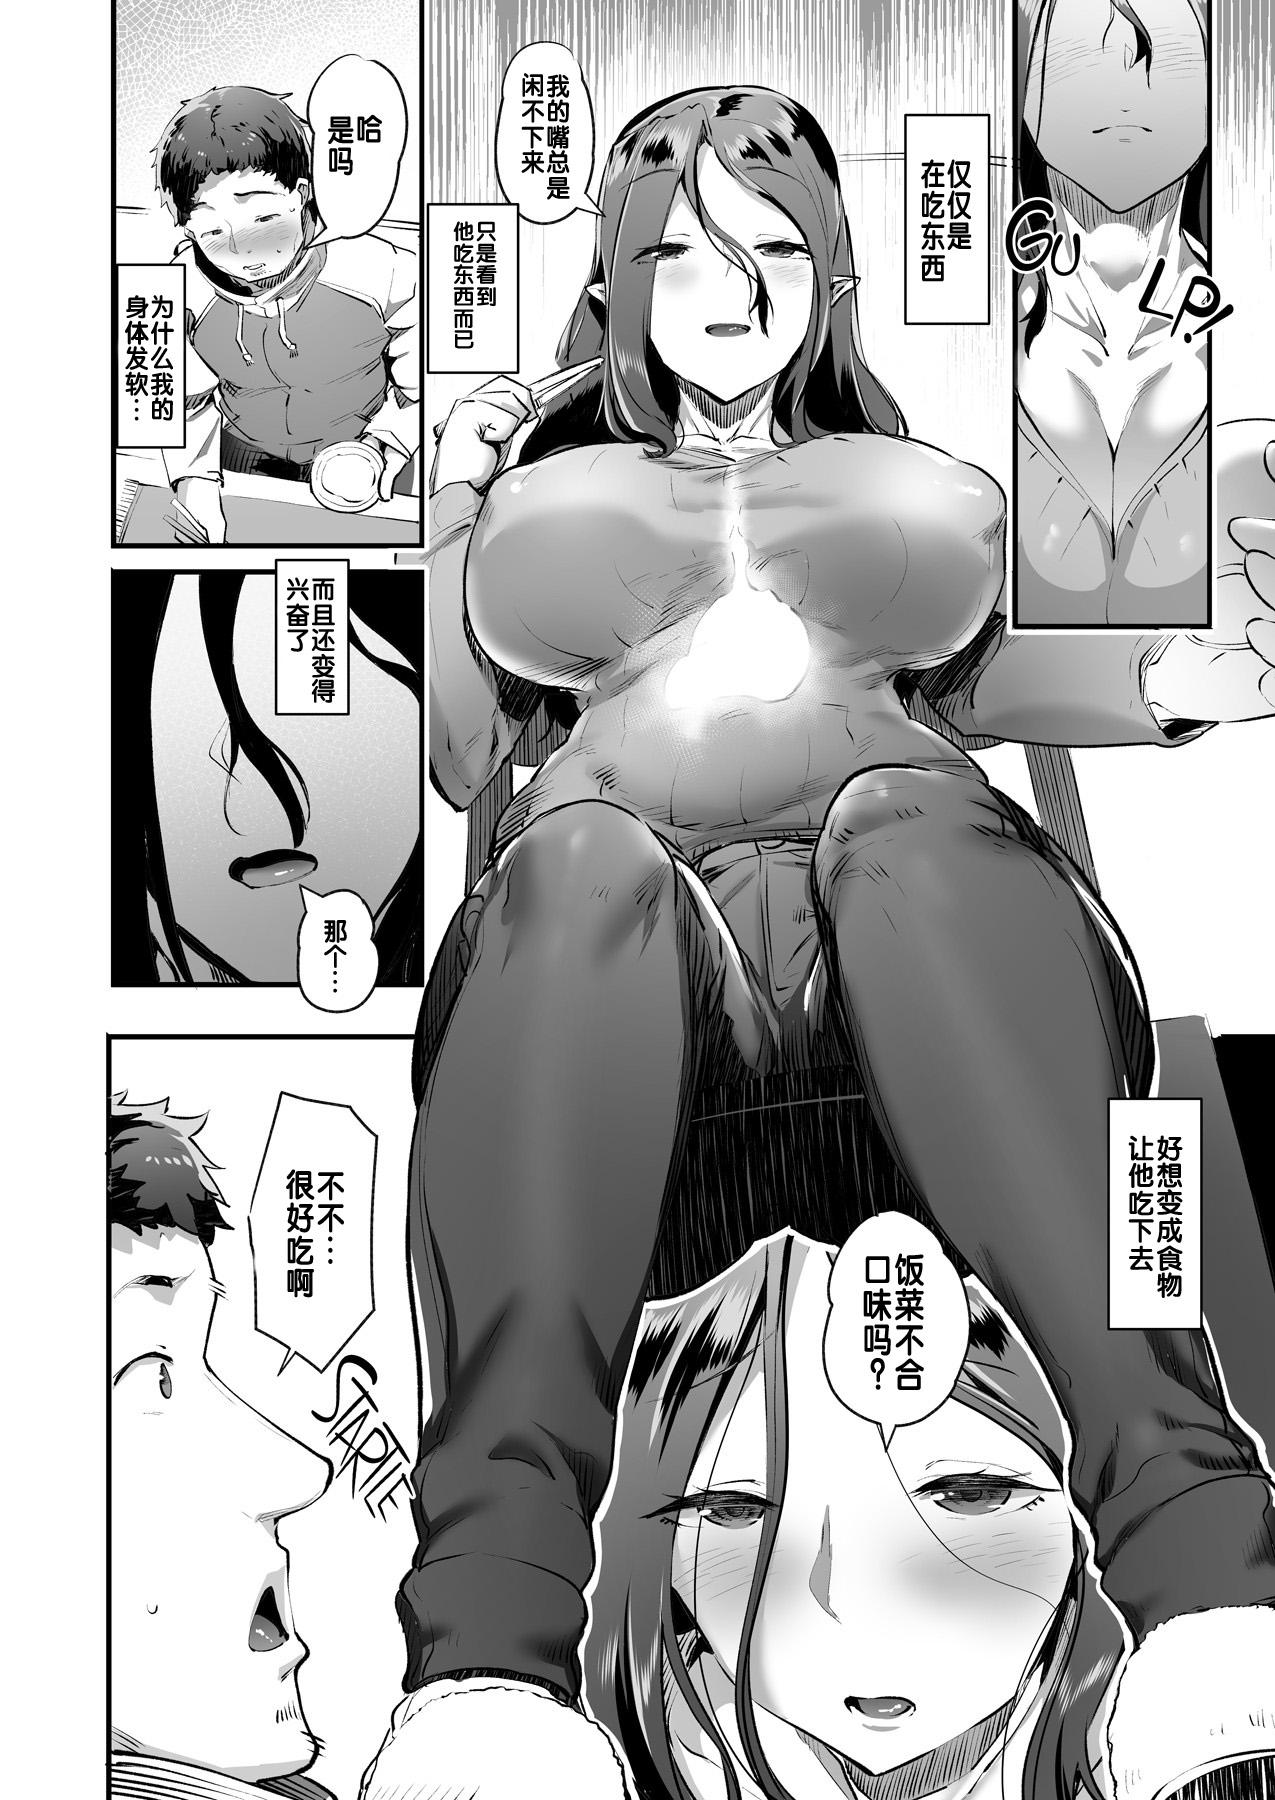 Succubus Miboujin Hirusagari no Himitsu 7